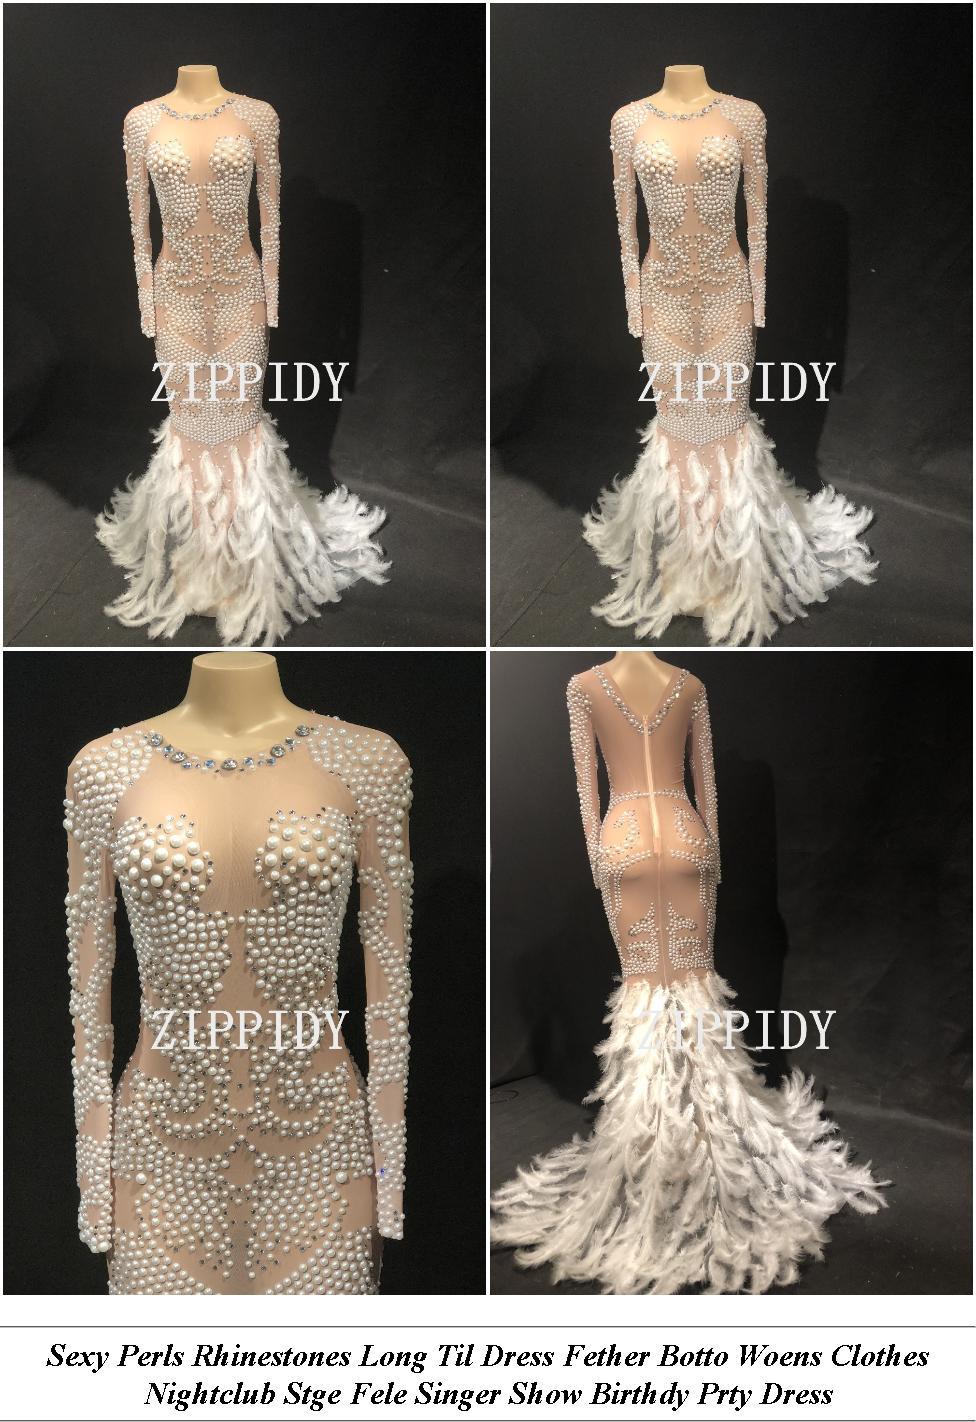 Sexy Maxi Dresses - Summer Dress Sale Clearance - Mini Dress - Cheap Clothes Online Shop